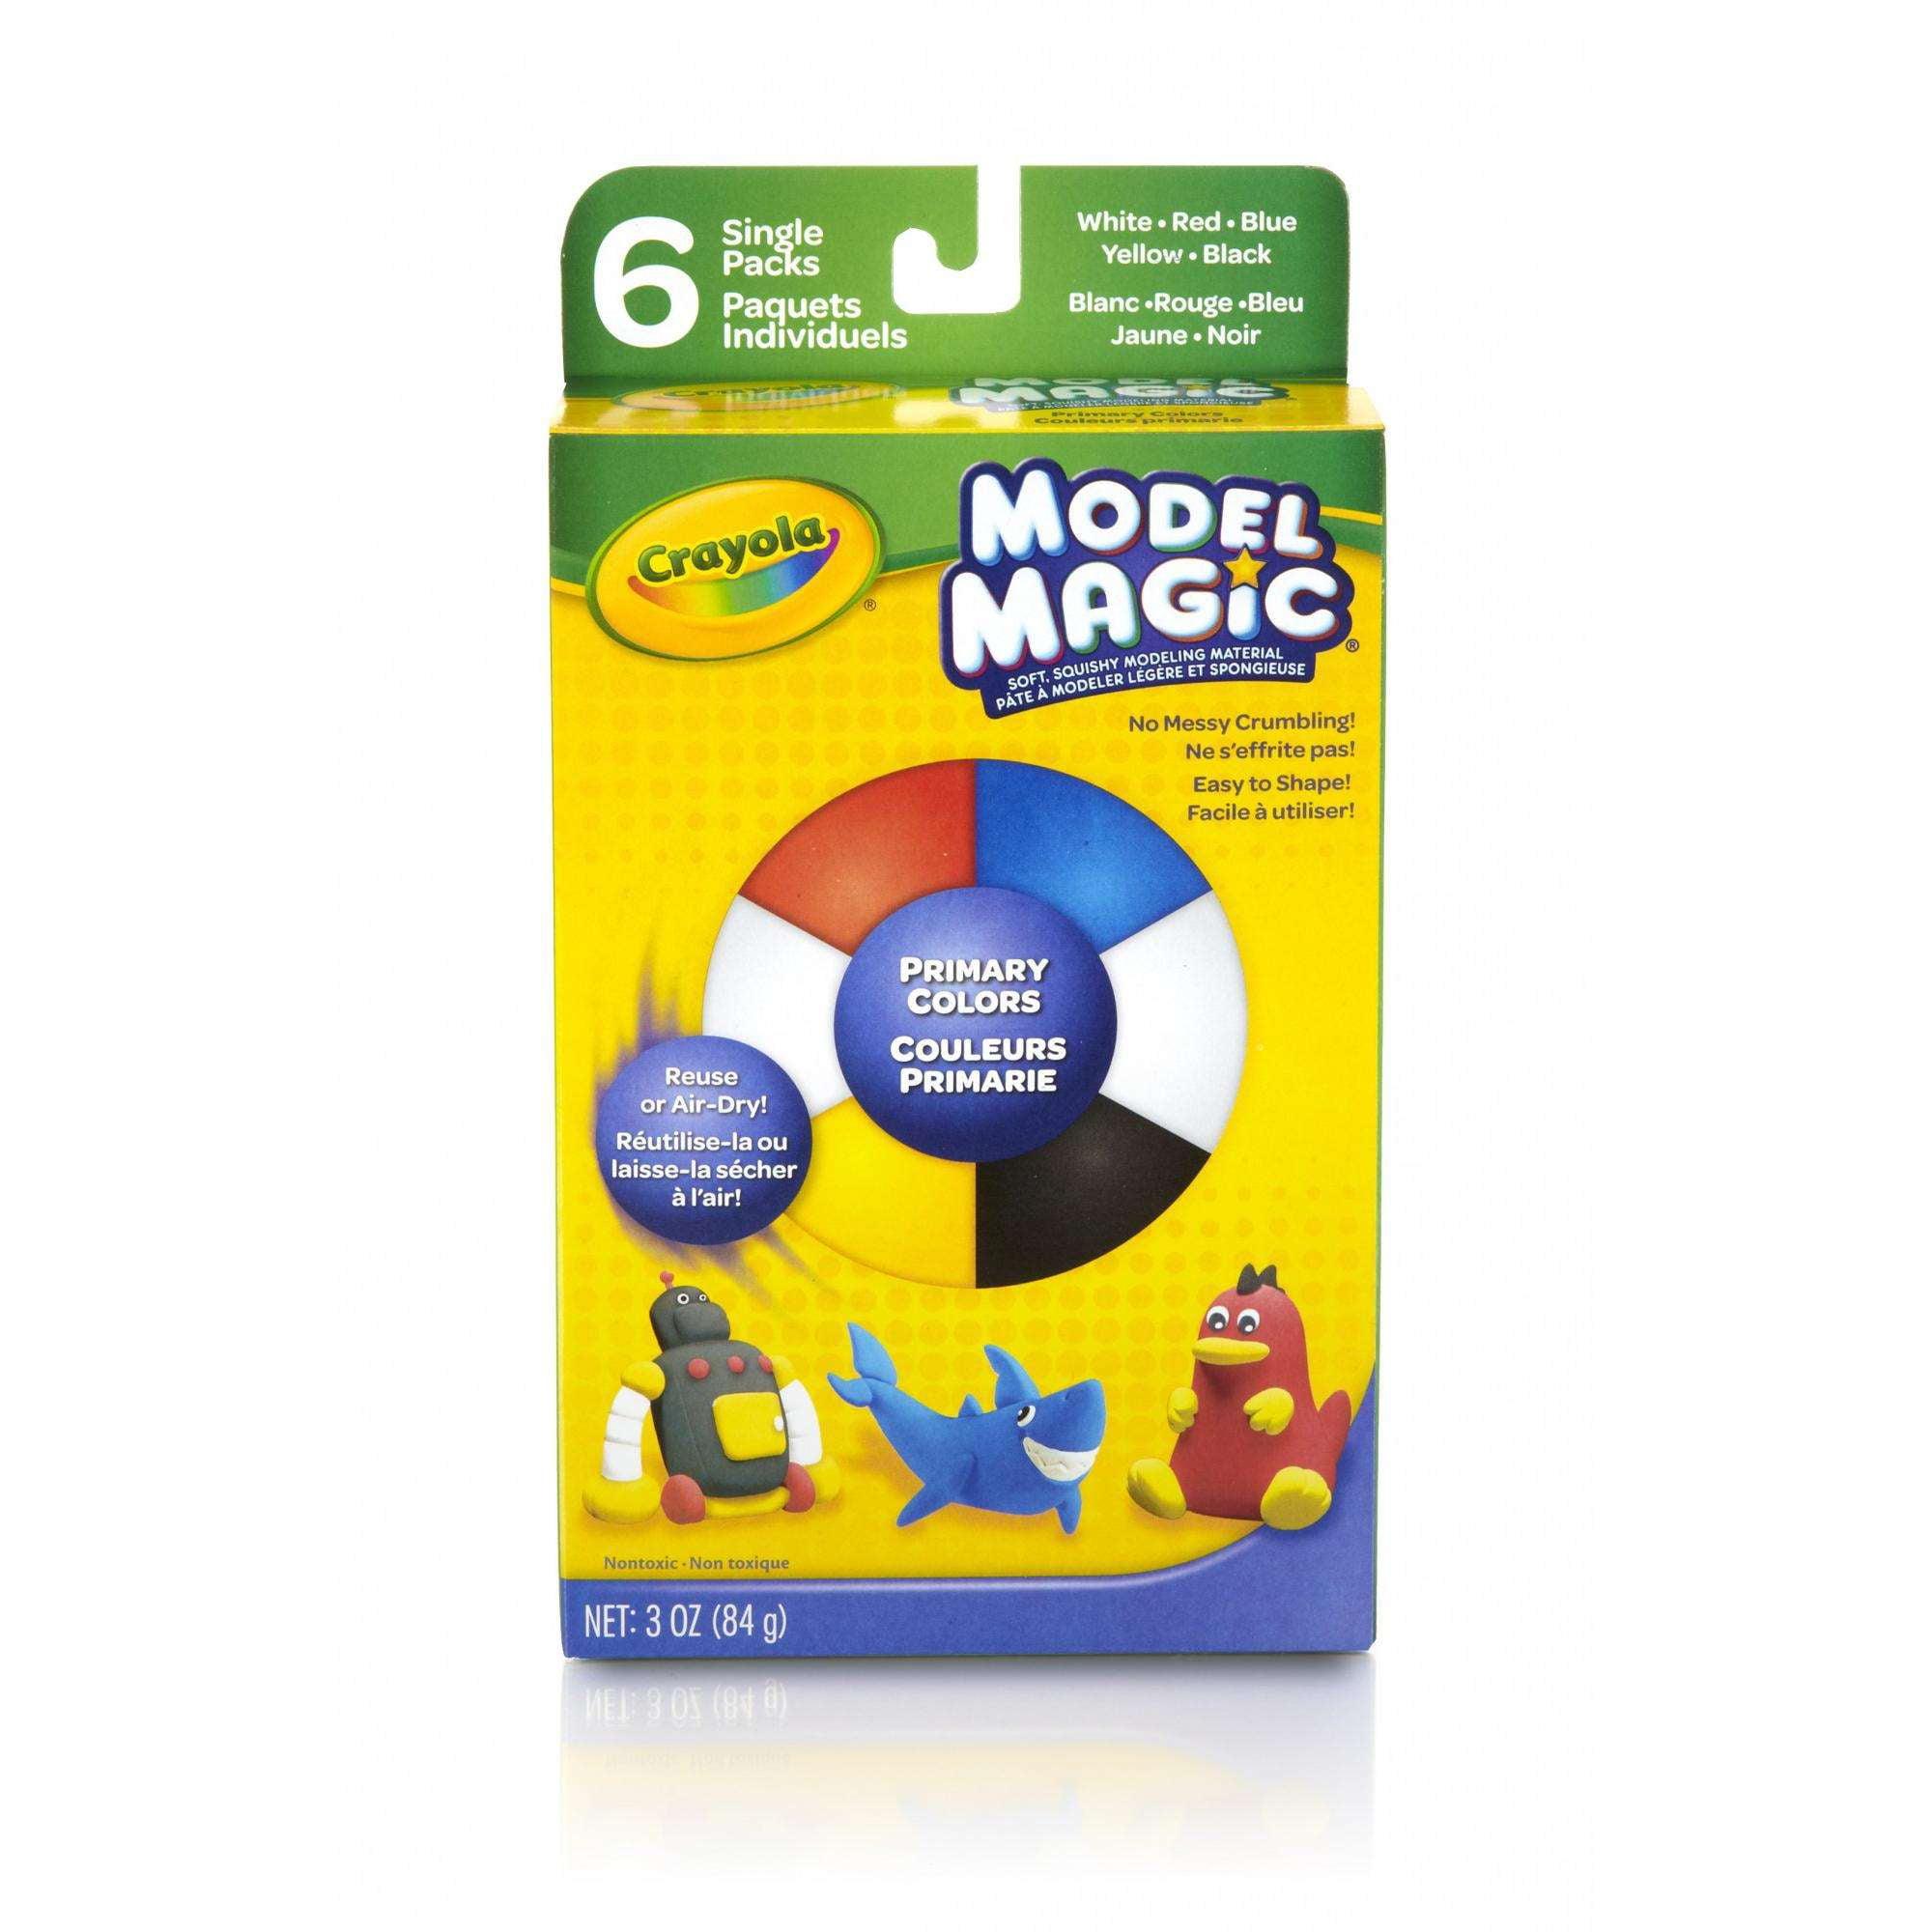 Crayola Model Magic, Primary Colors, Clay Alternative for Kids, 3oz by Crayola LLC